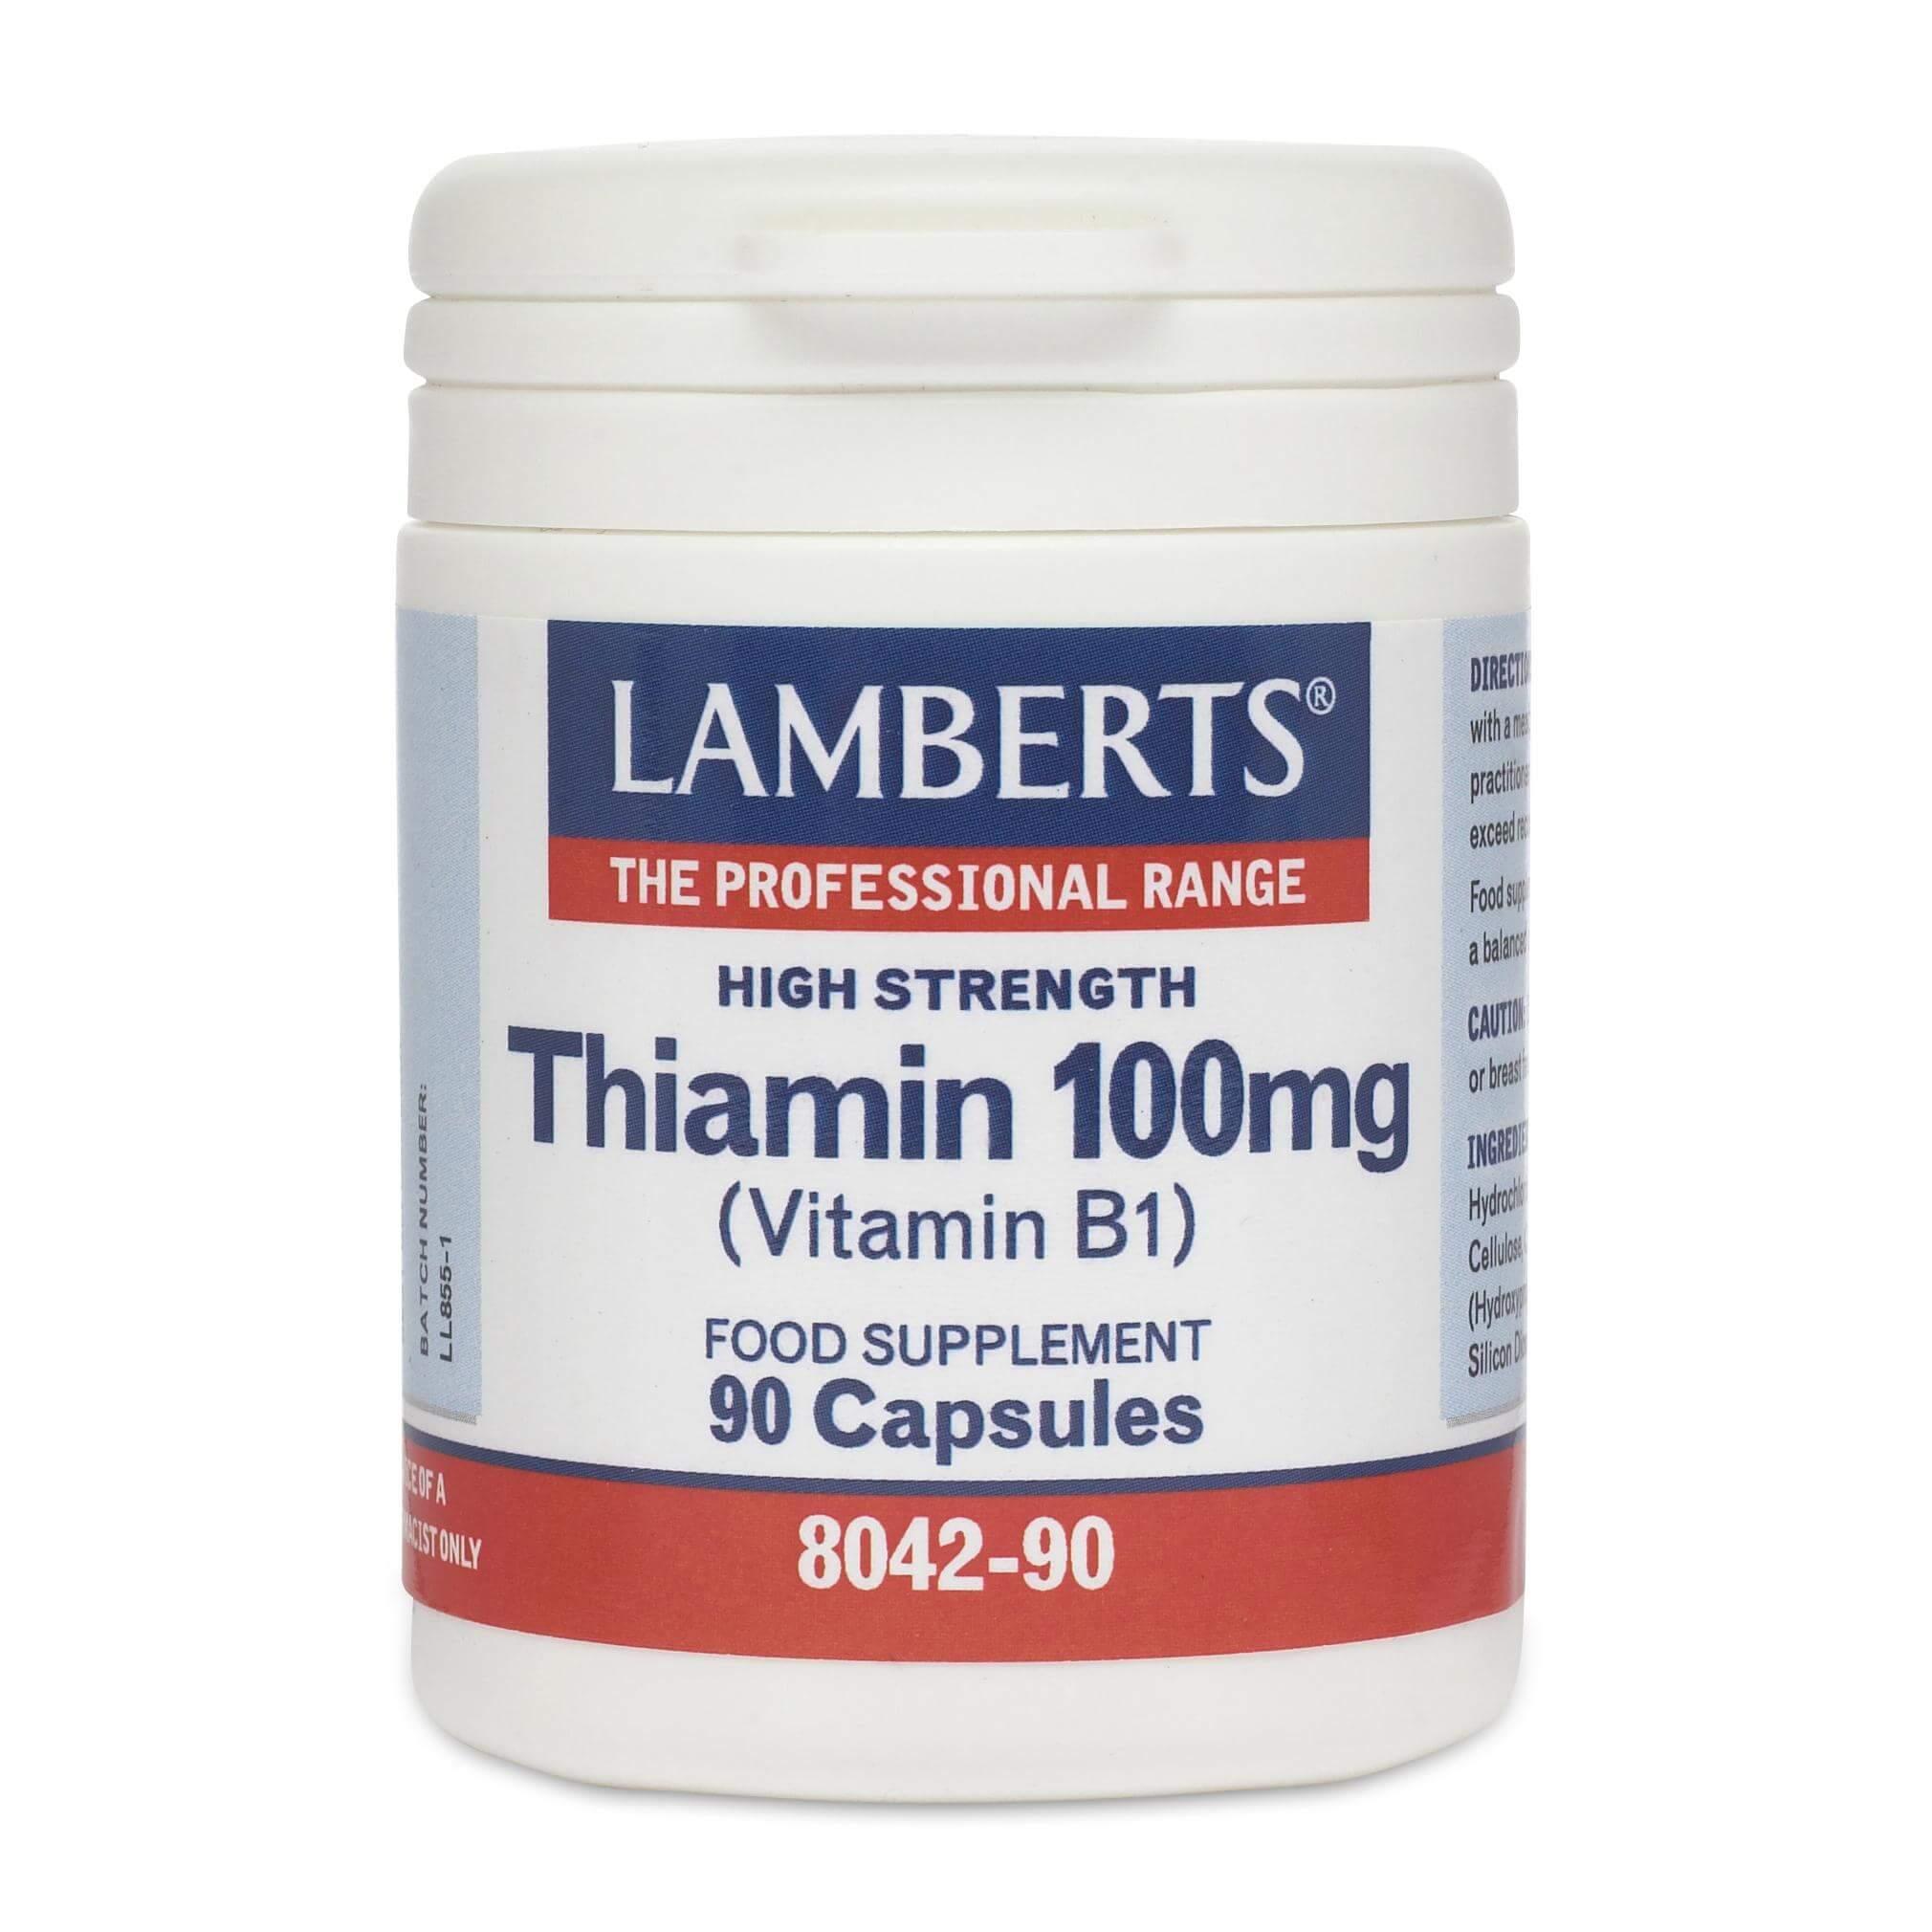 Lamberts Thiamin Συμπλήρωμα Διατροφής Βιταμίνης Β1 100mg 90caps